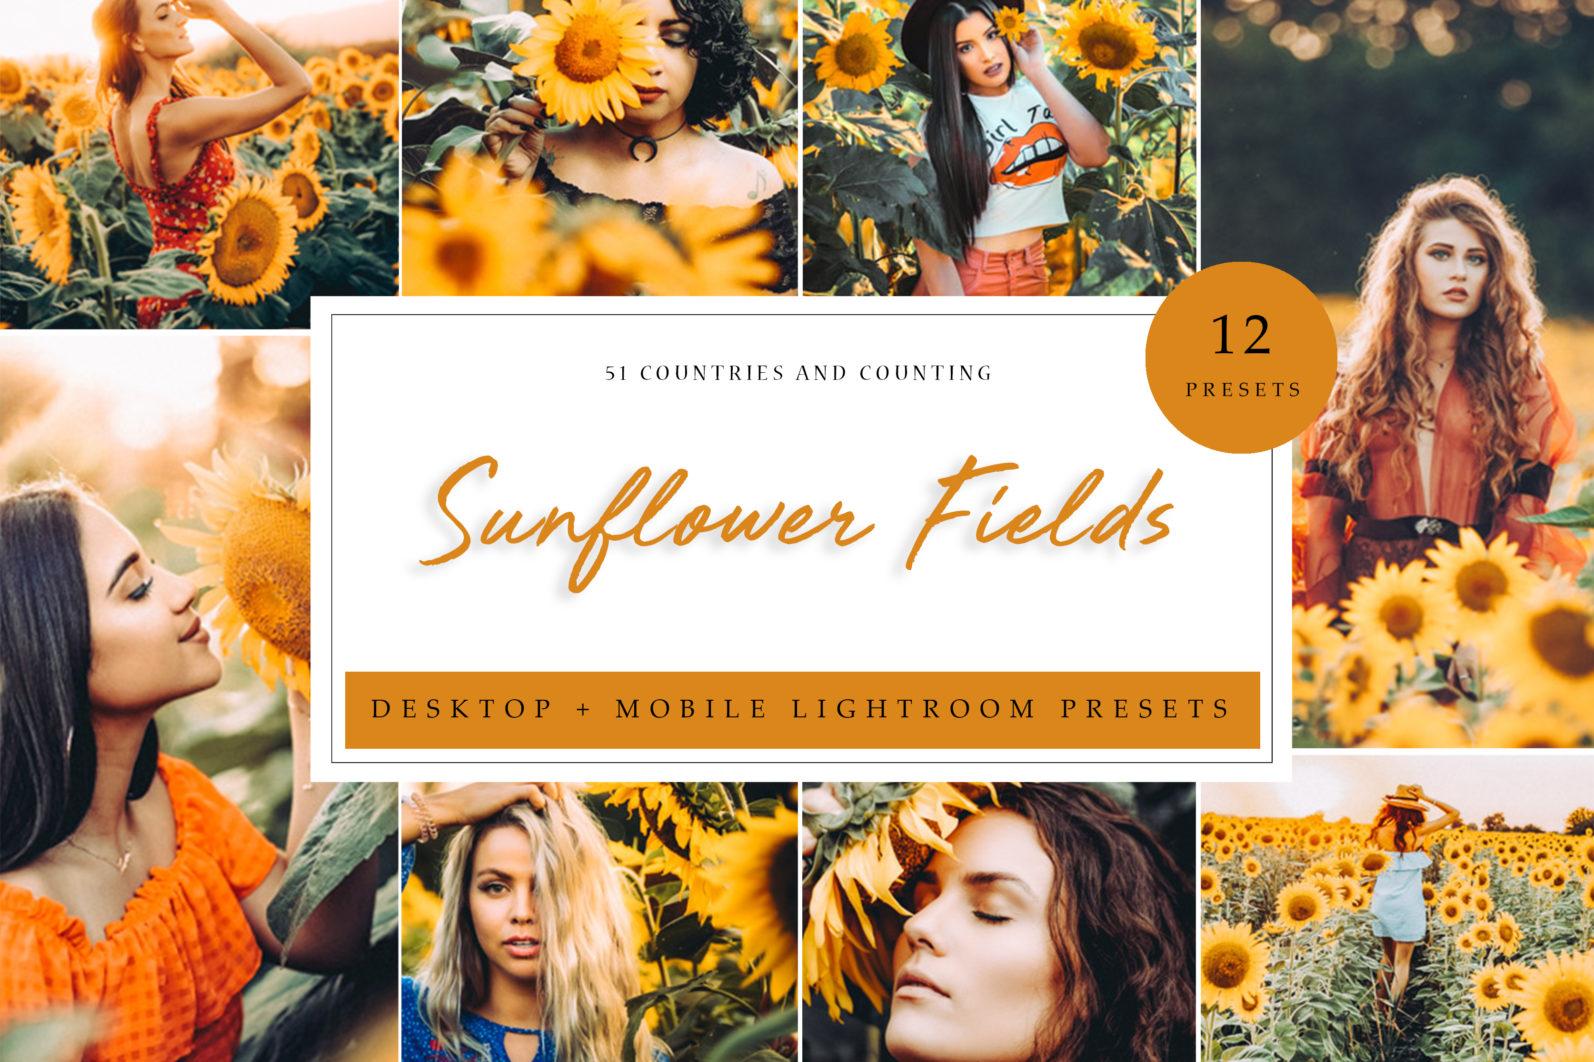 12 x Sunflower Fields Lightroom Presets   Warm Lightroom Presets   Yellow Presets - Sunflower Fields Bundle scaled -